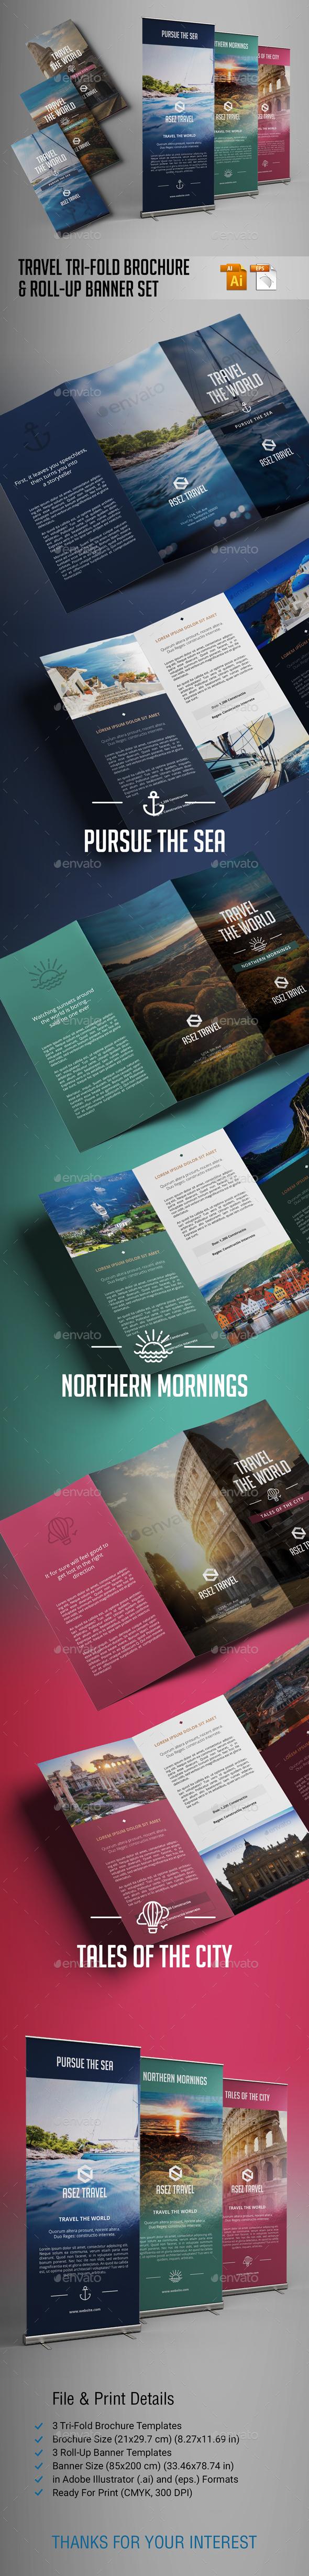 Travel Brochure and Banner Set - Brochures Print Templates